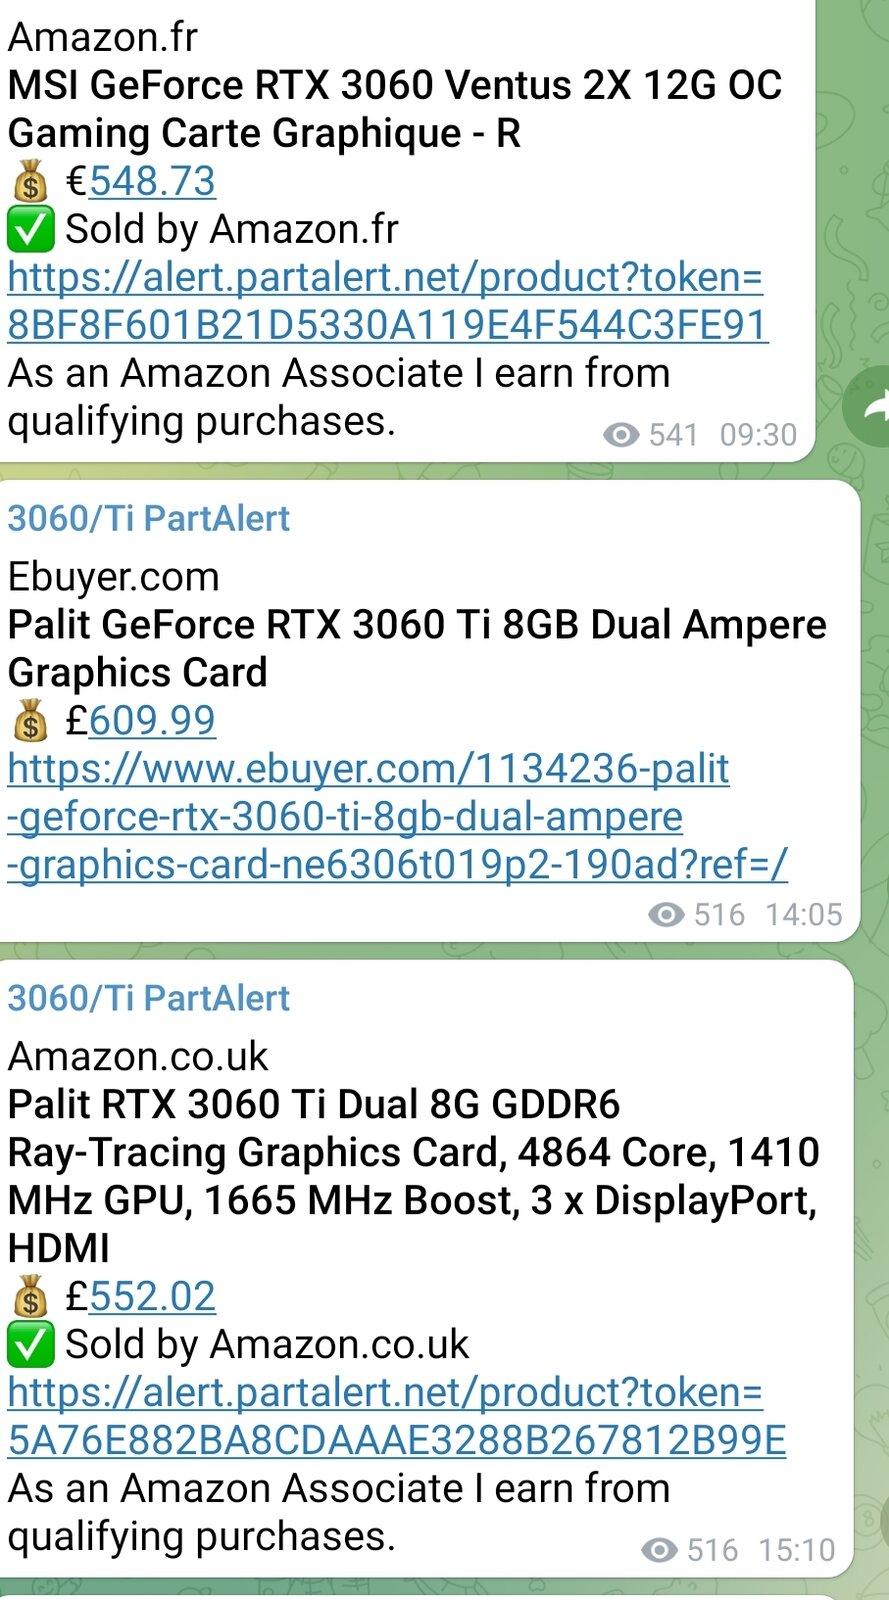 SmartSelect_20210805-104552_Telegram.jpg